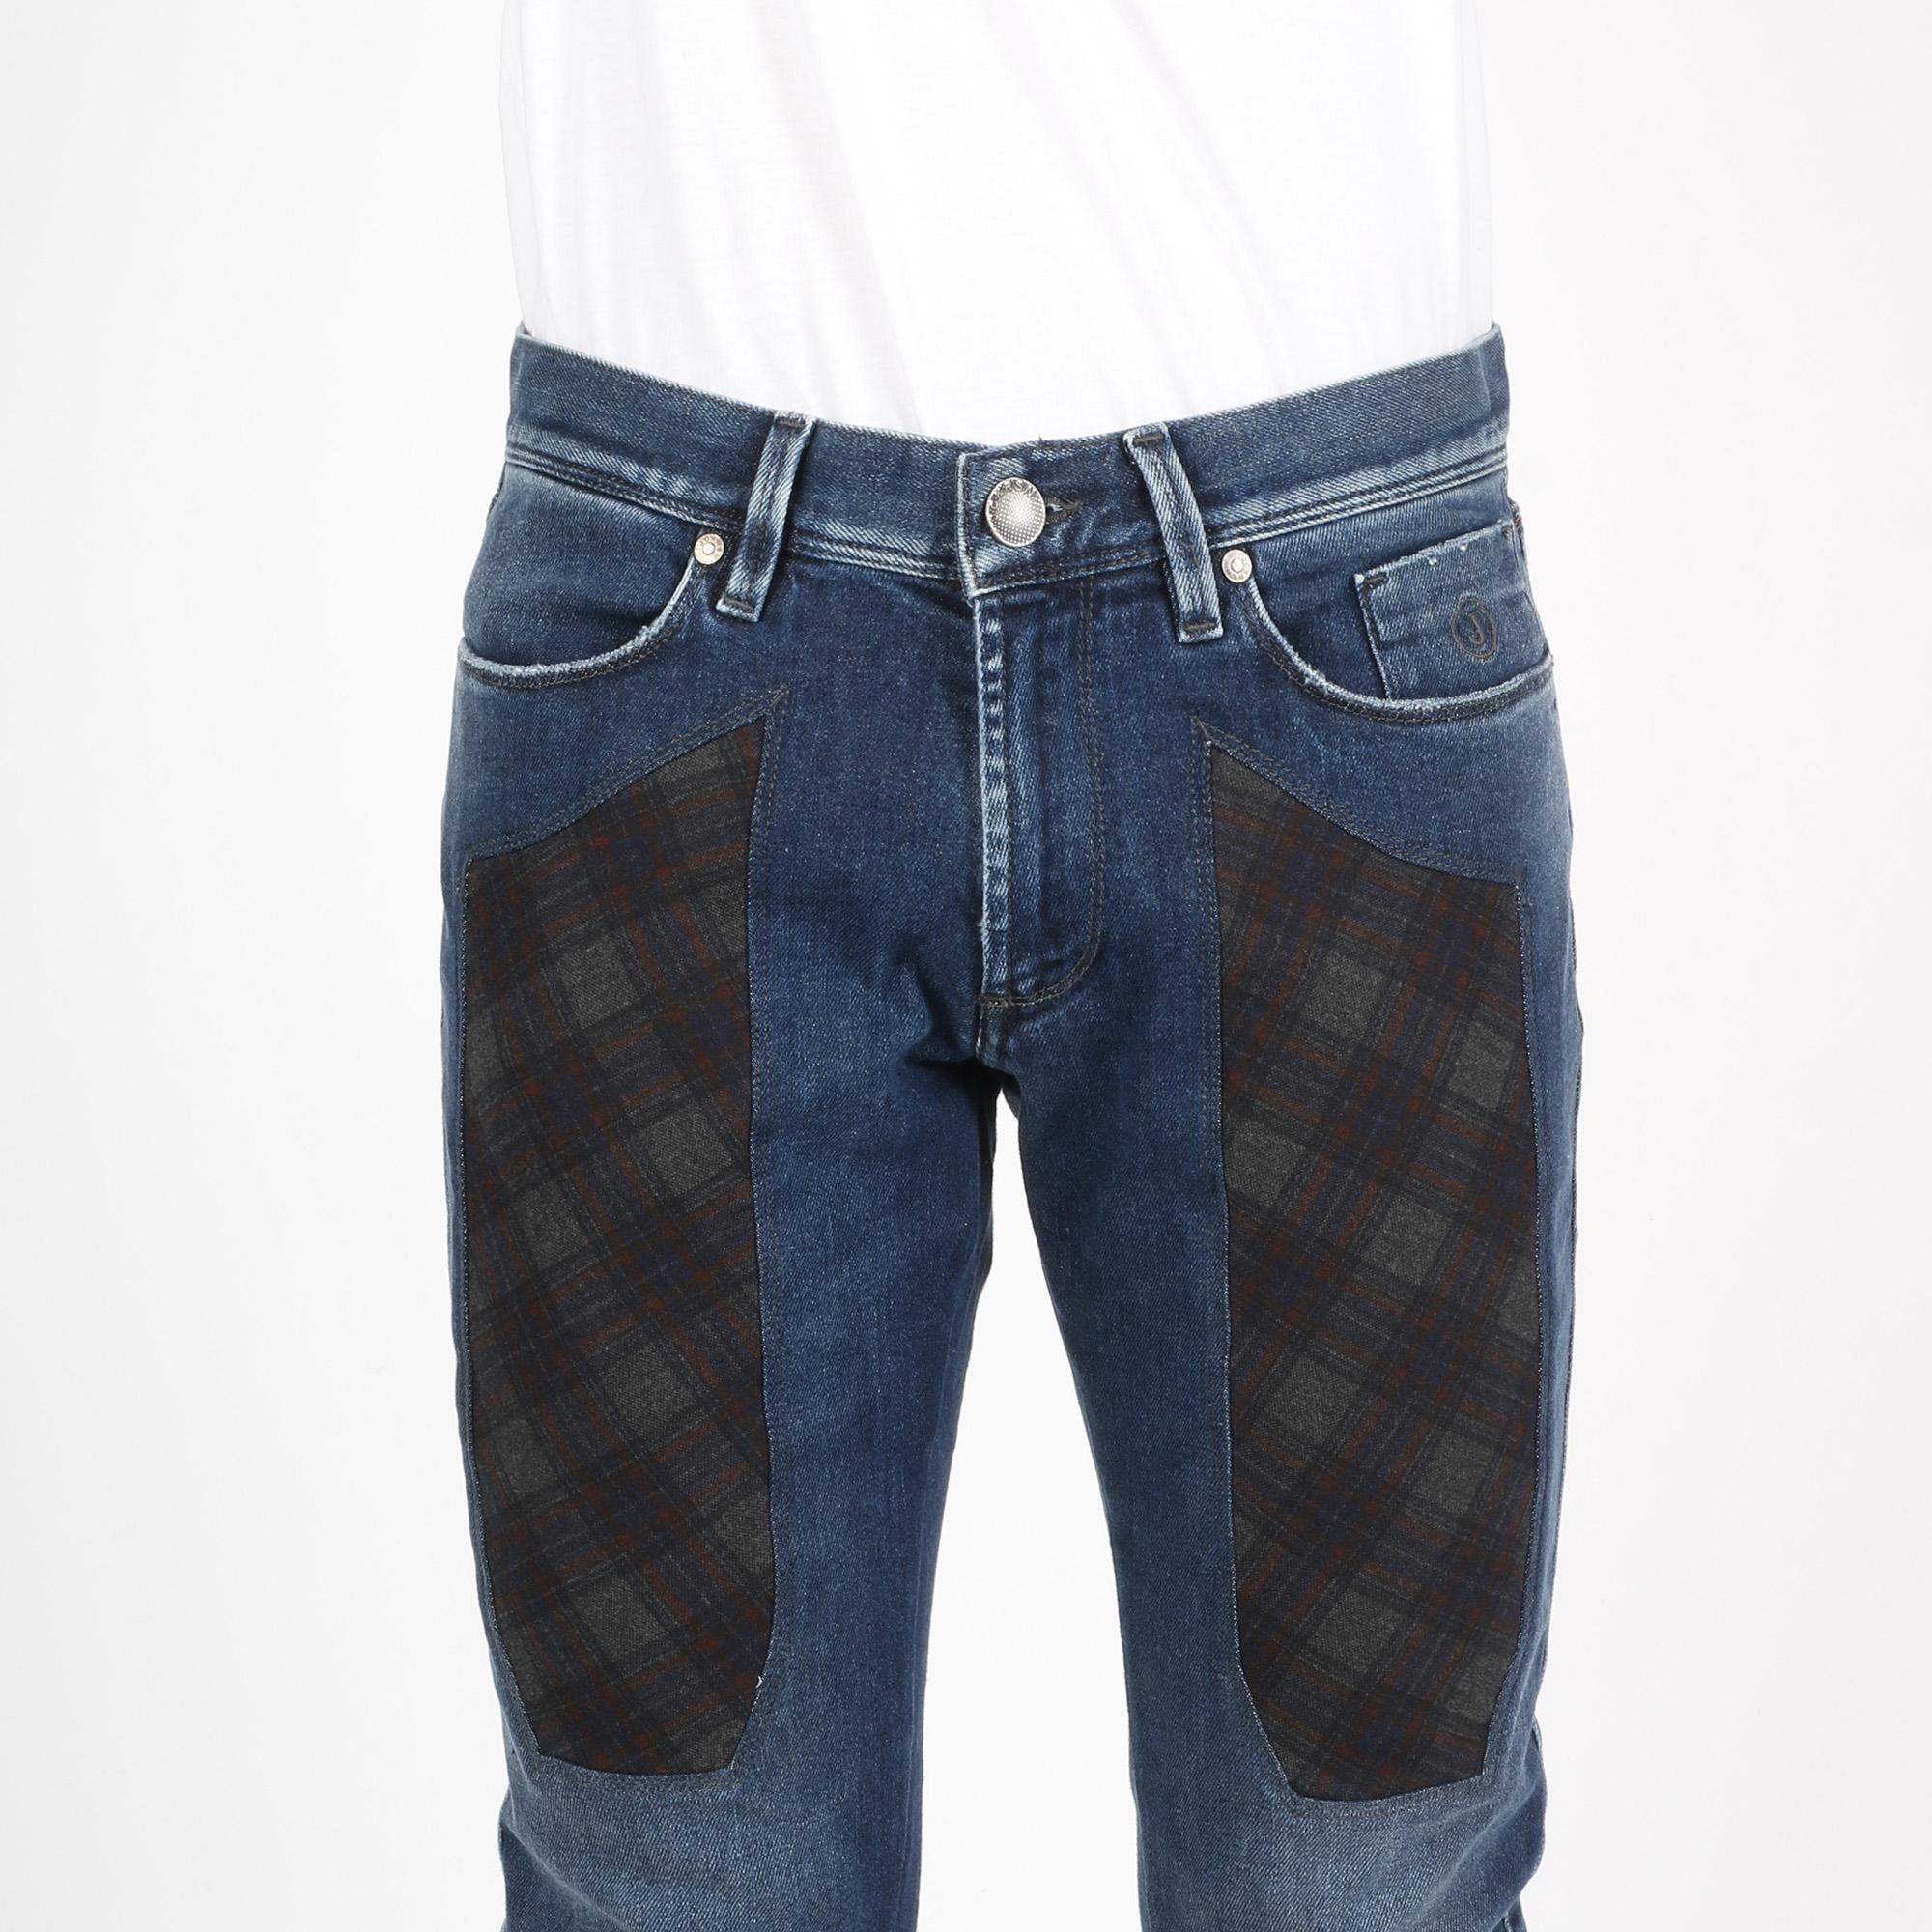 Jeans toppa check - Denim